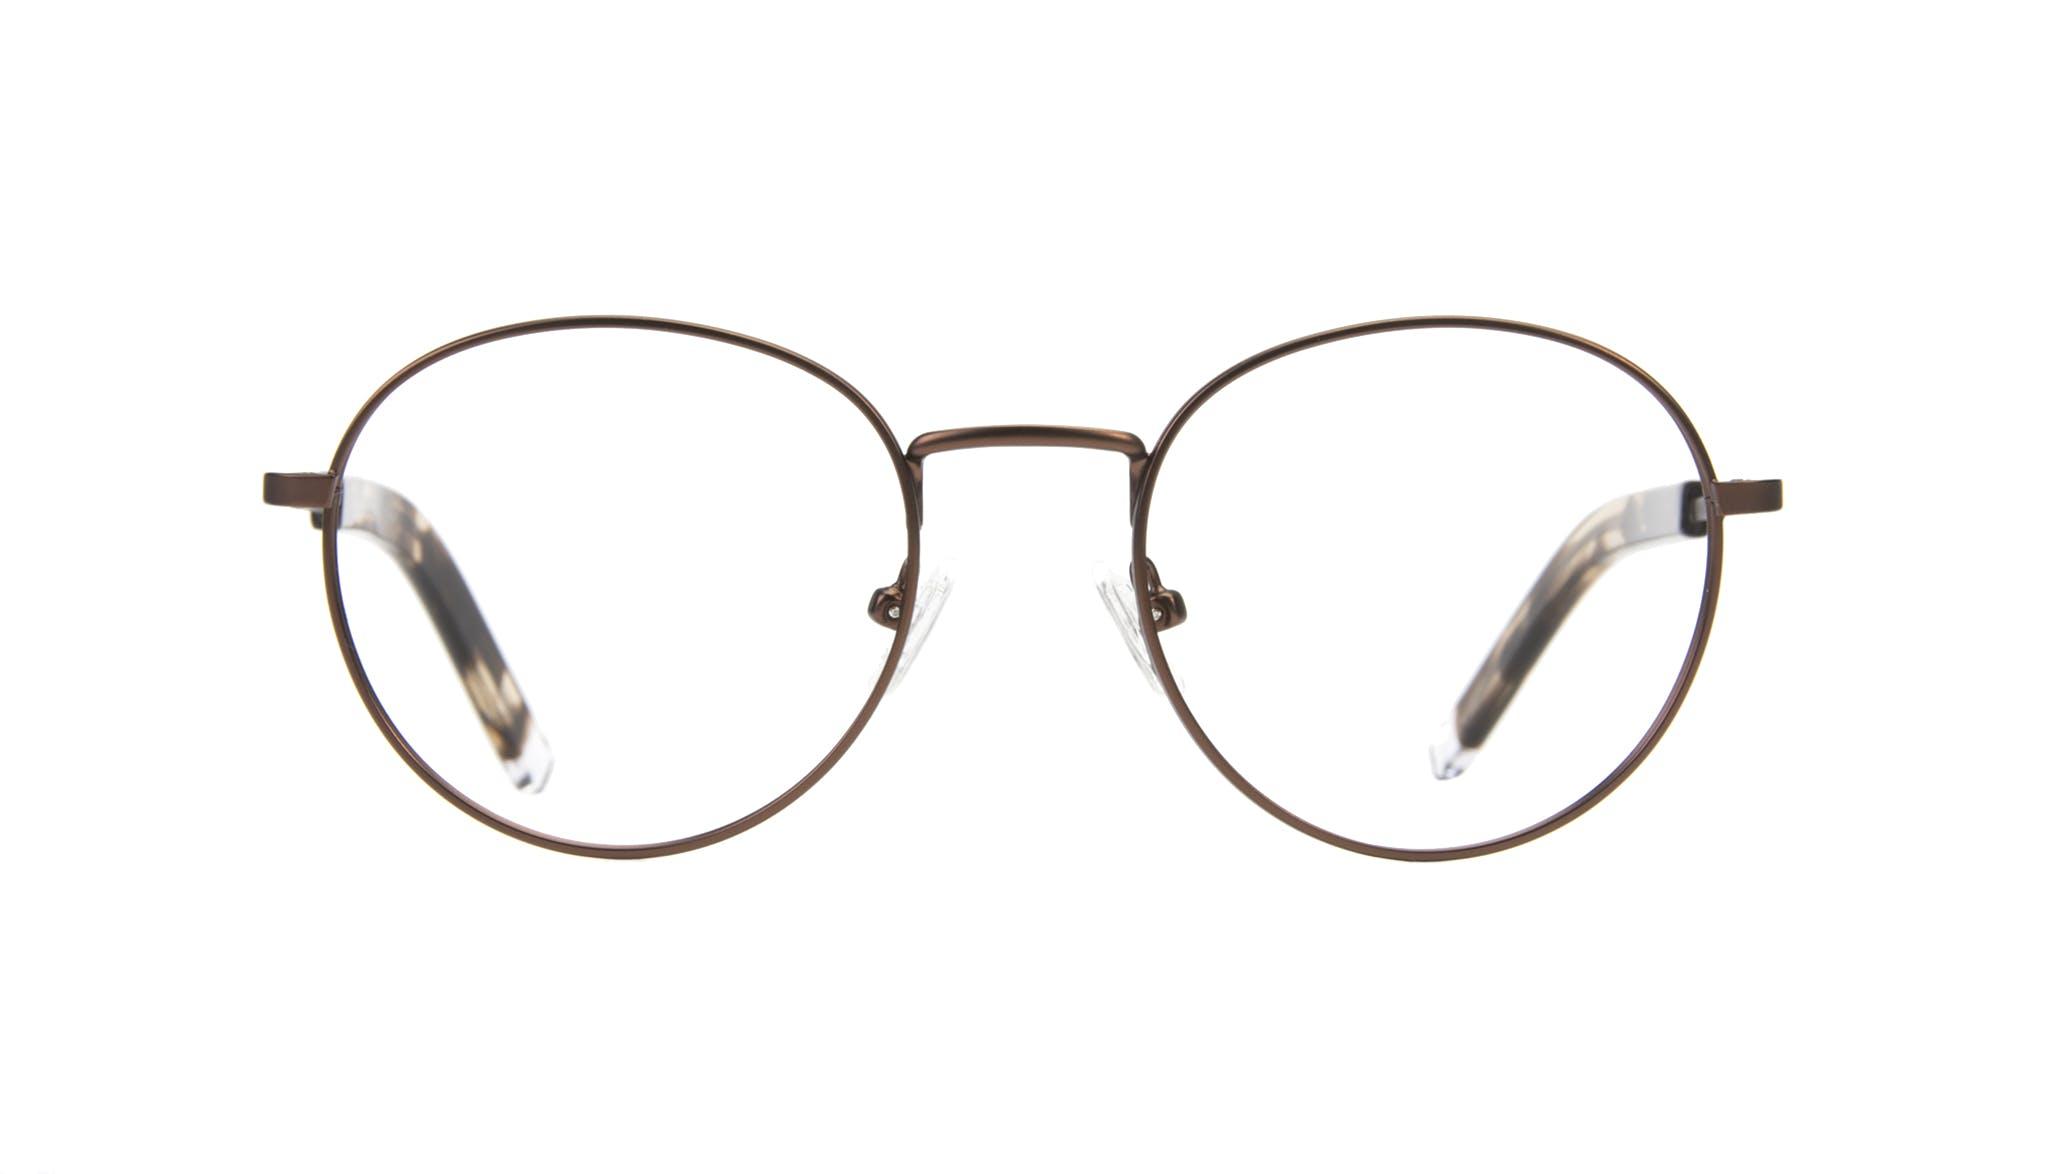 Affordable Fashion Glasses Round Eyeglasses Men Lean Mud Front